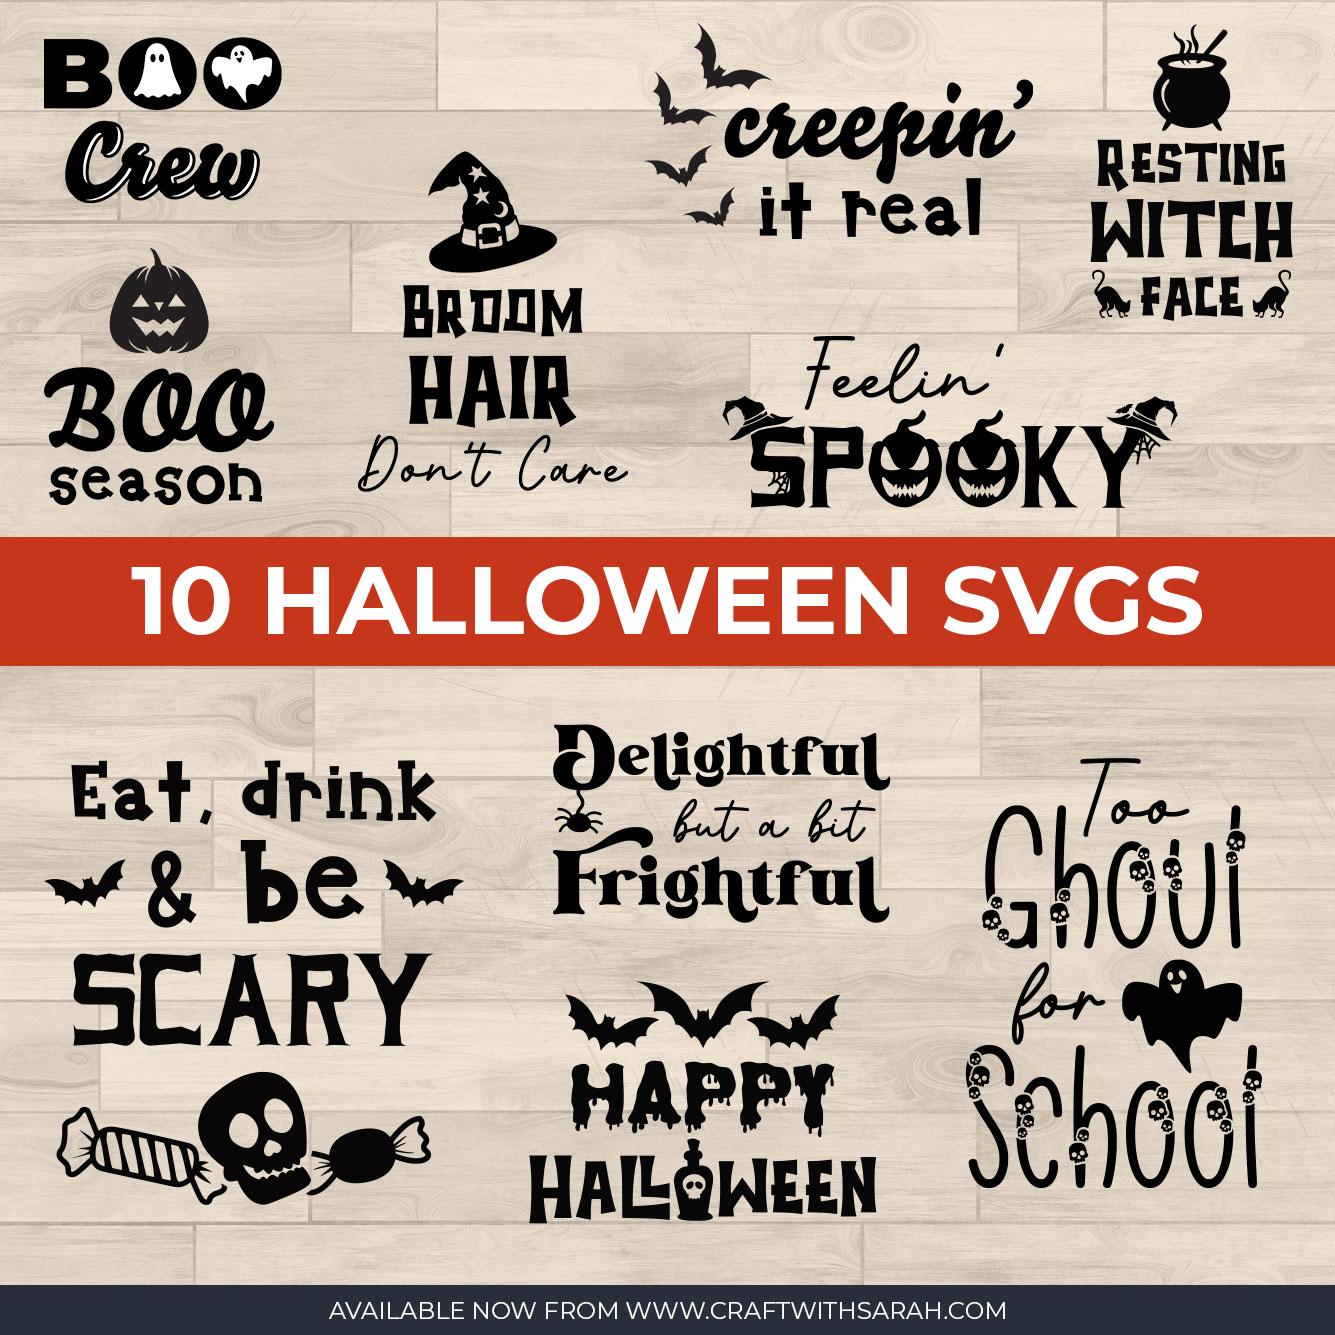 10 Cricut Vinyl Ideas for Halloween Crafts [HCC Day 18]